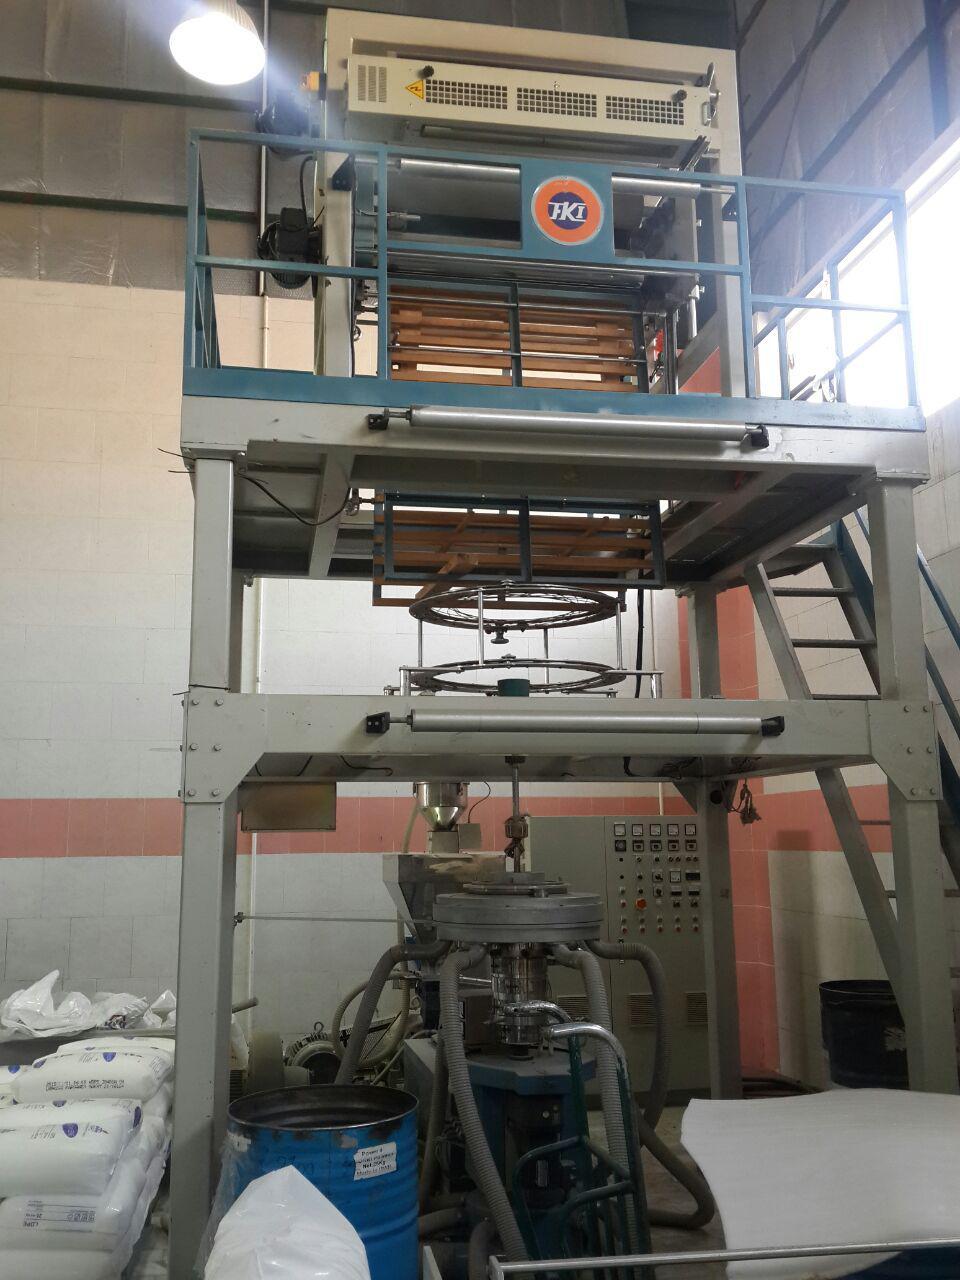 بورس ماشین آلات نایلون،نایلکس و چاپ تکفروش دستگاه تولید نایلون و نایلکس تایوانی